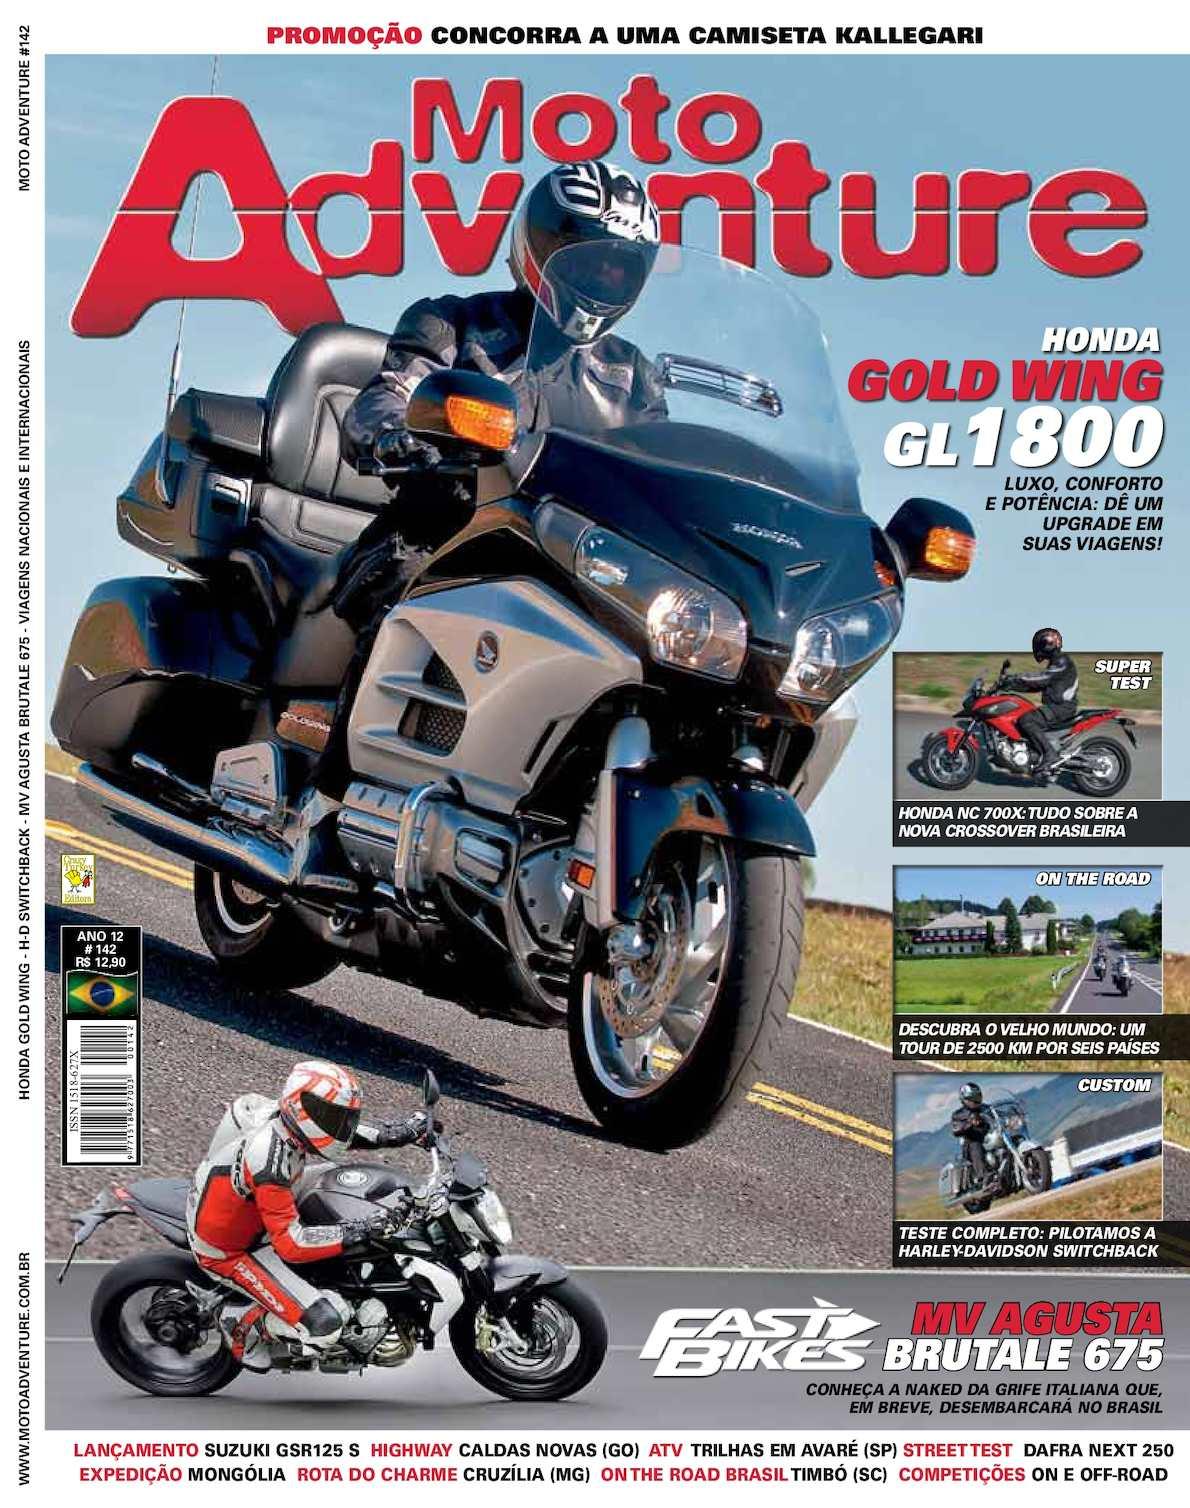 Calaméo - Moto Adventure 142 Web Setembro 89172def31247